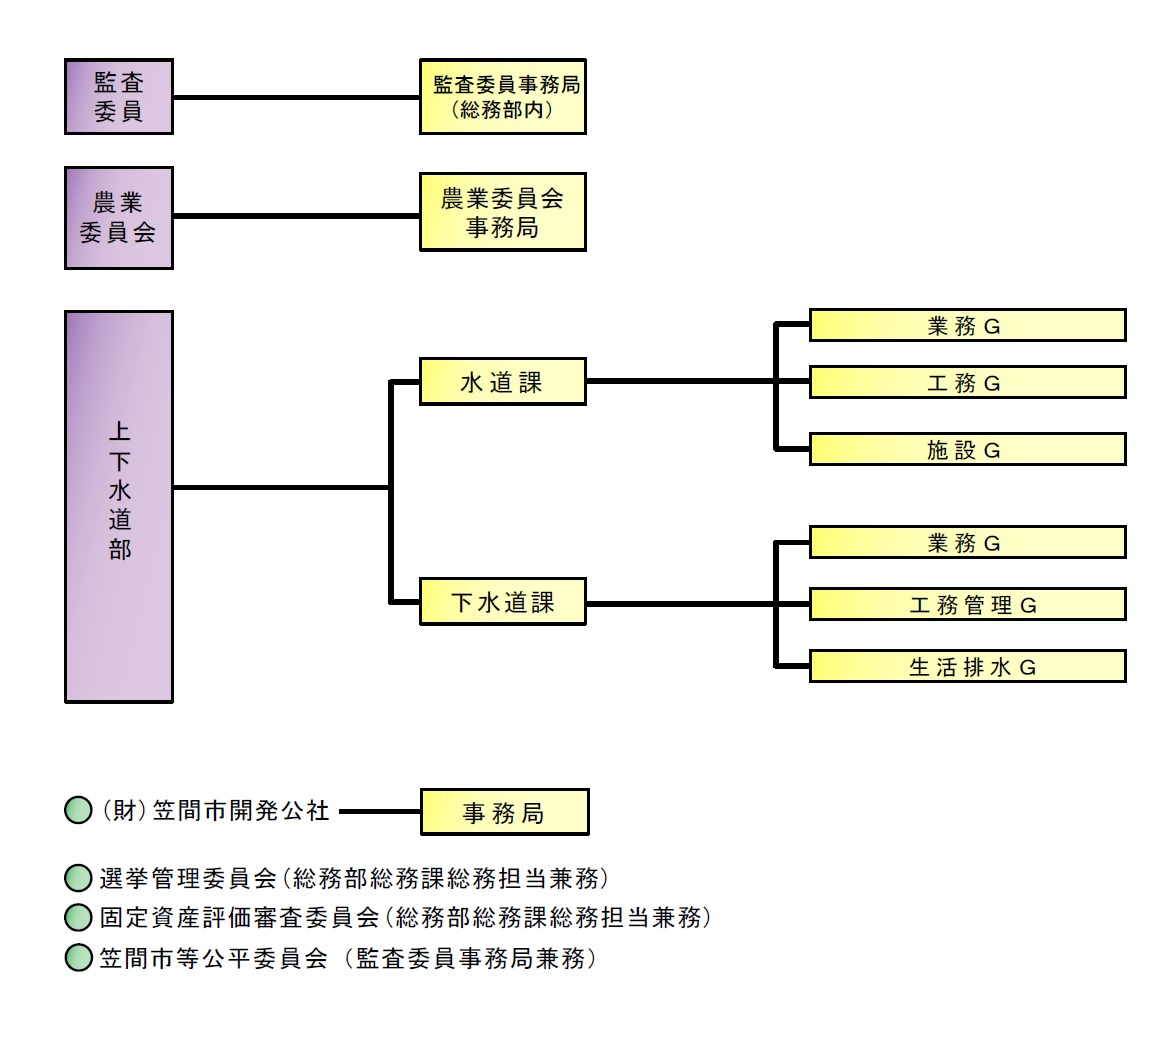 『『H30年度組織図(その他)』の画像』の画像